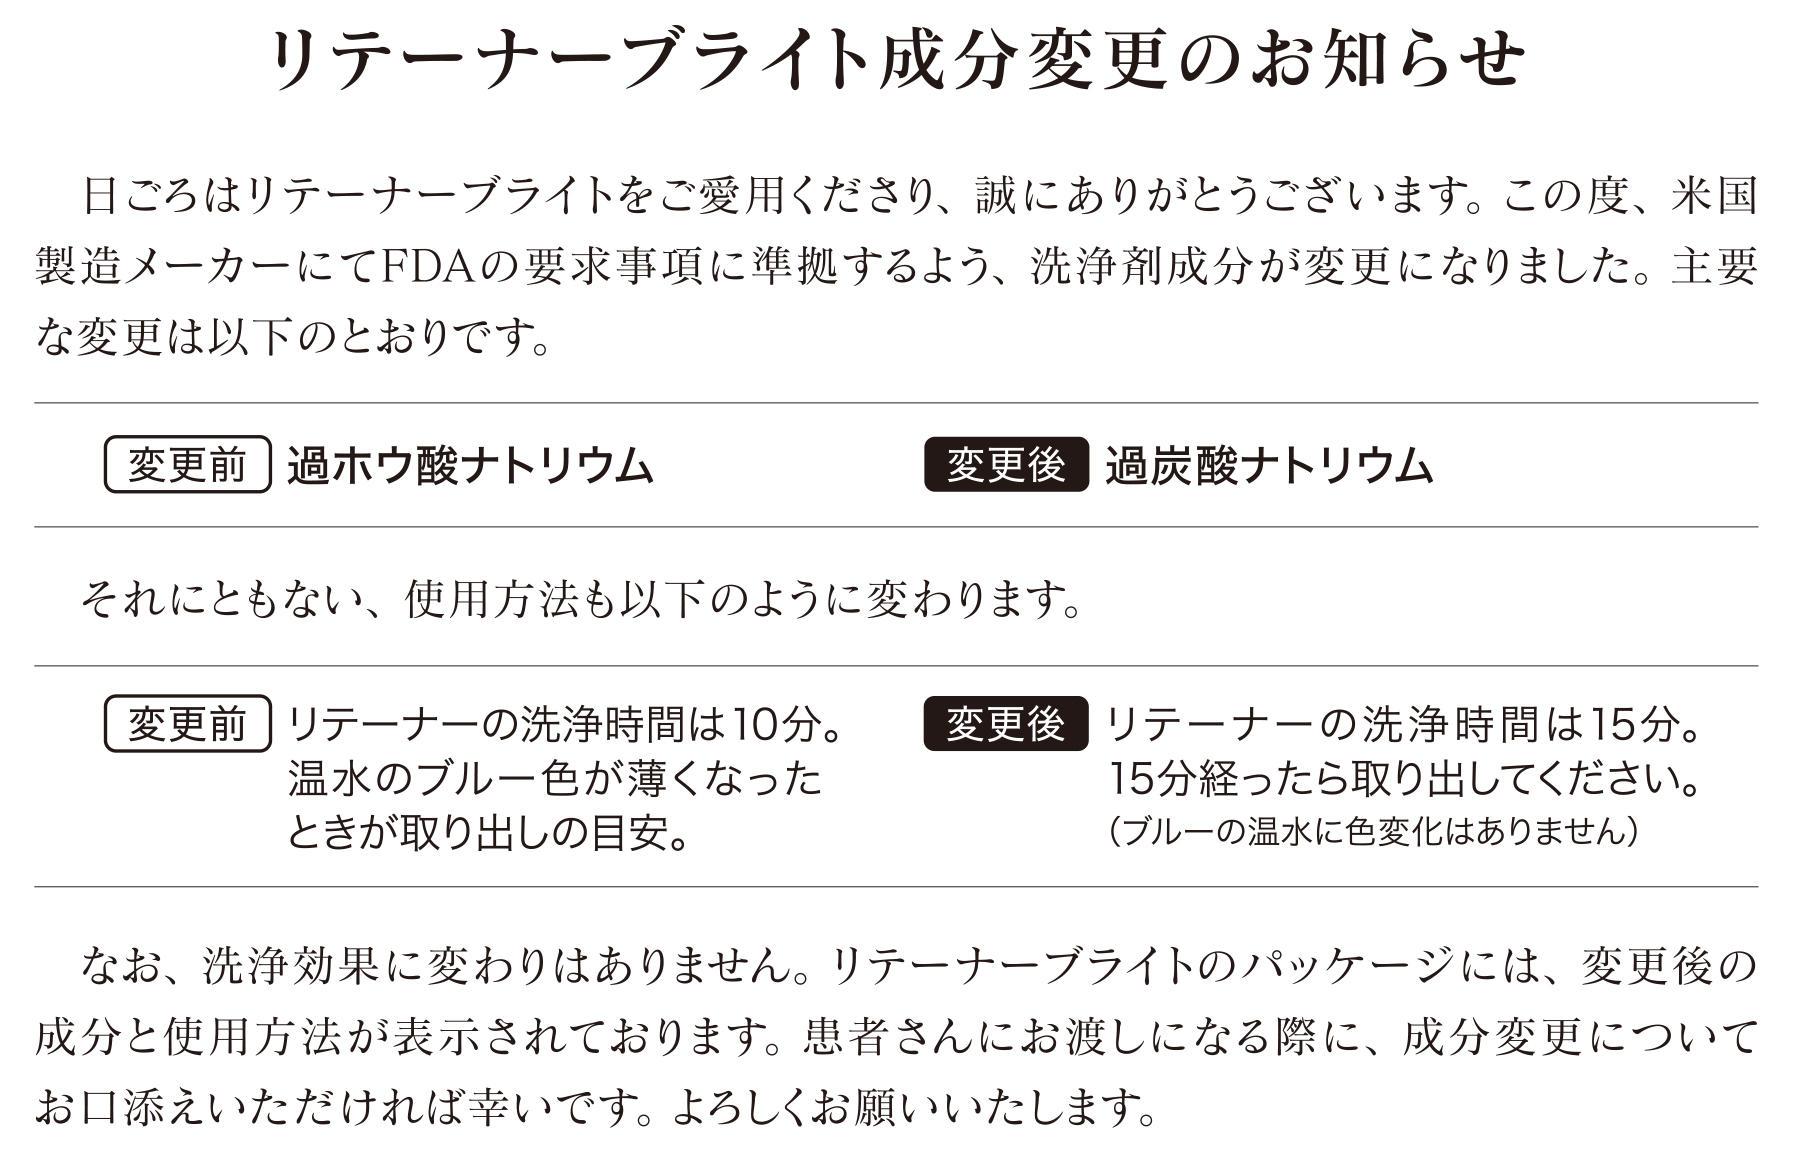 news_20180411.jpg